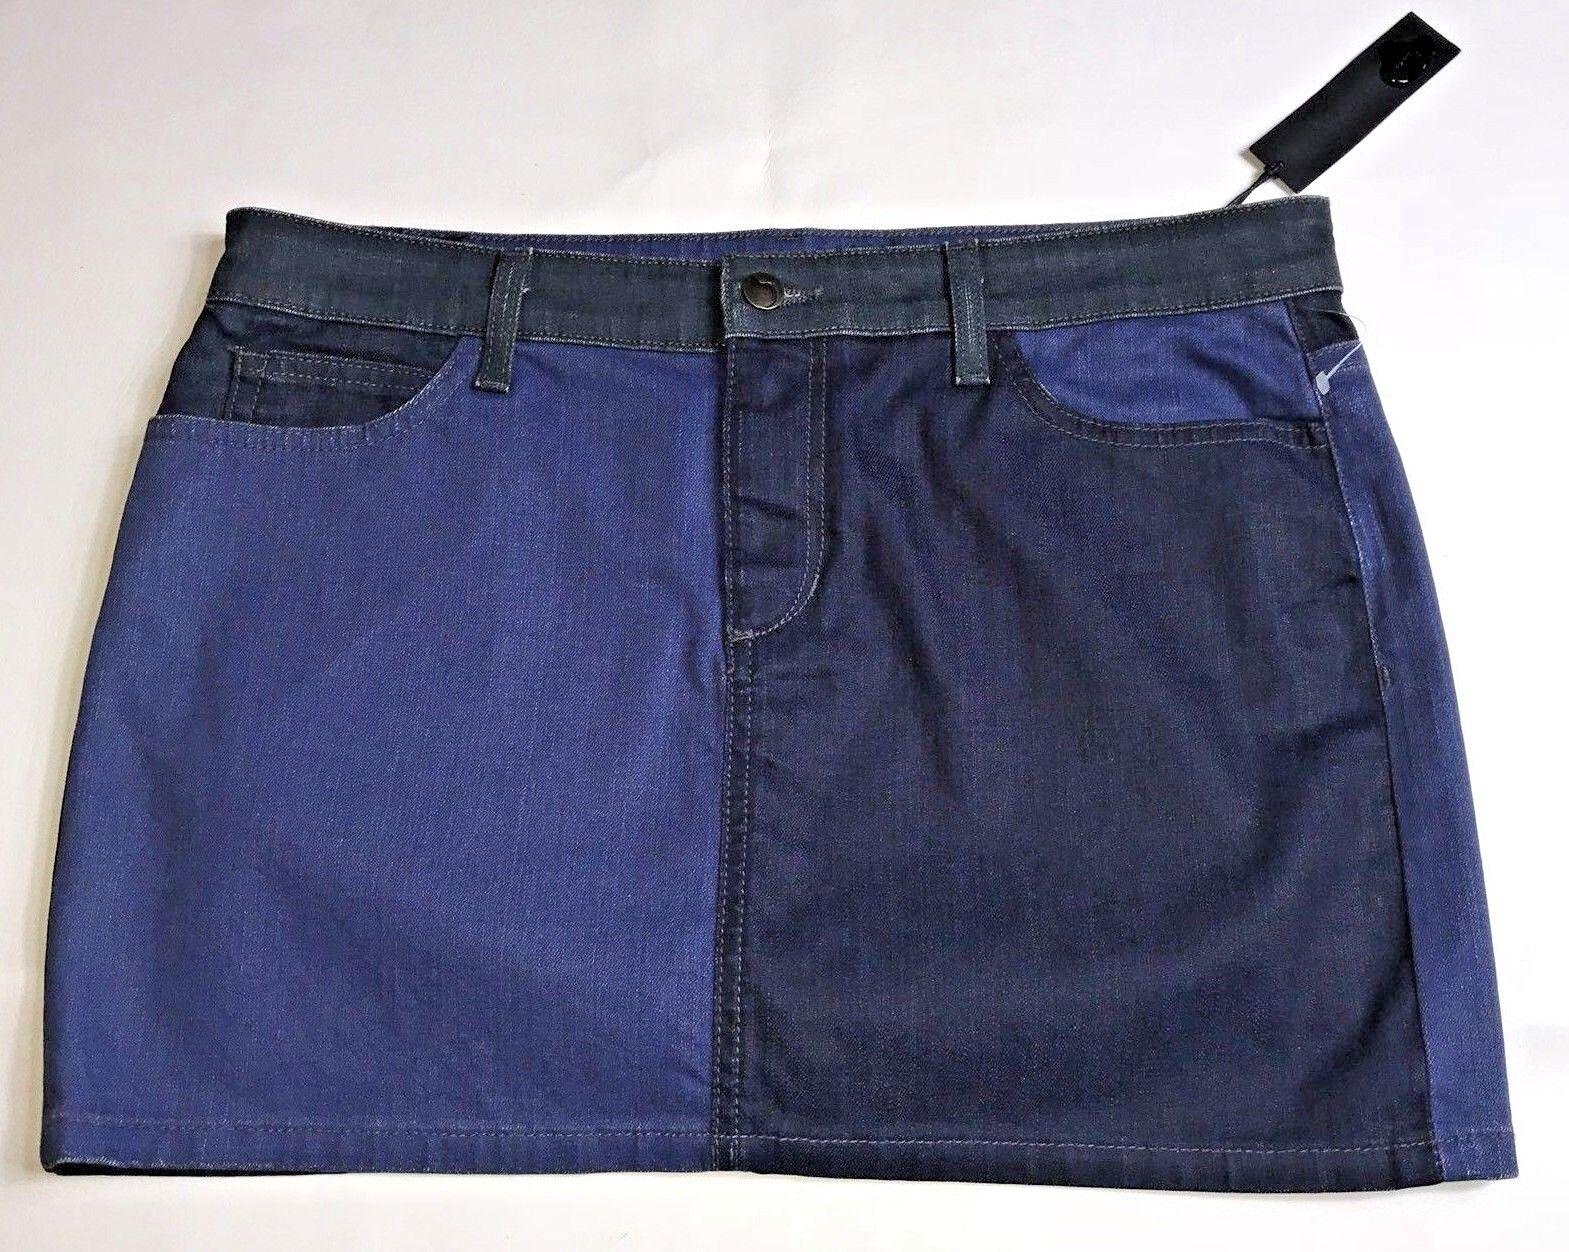 Joe's Womens Daisy bluees Skirt Size 31 Dark Patch Denim Jean Cotton Stretch Mini